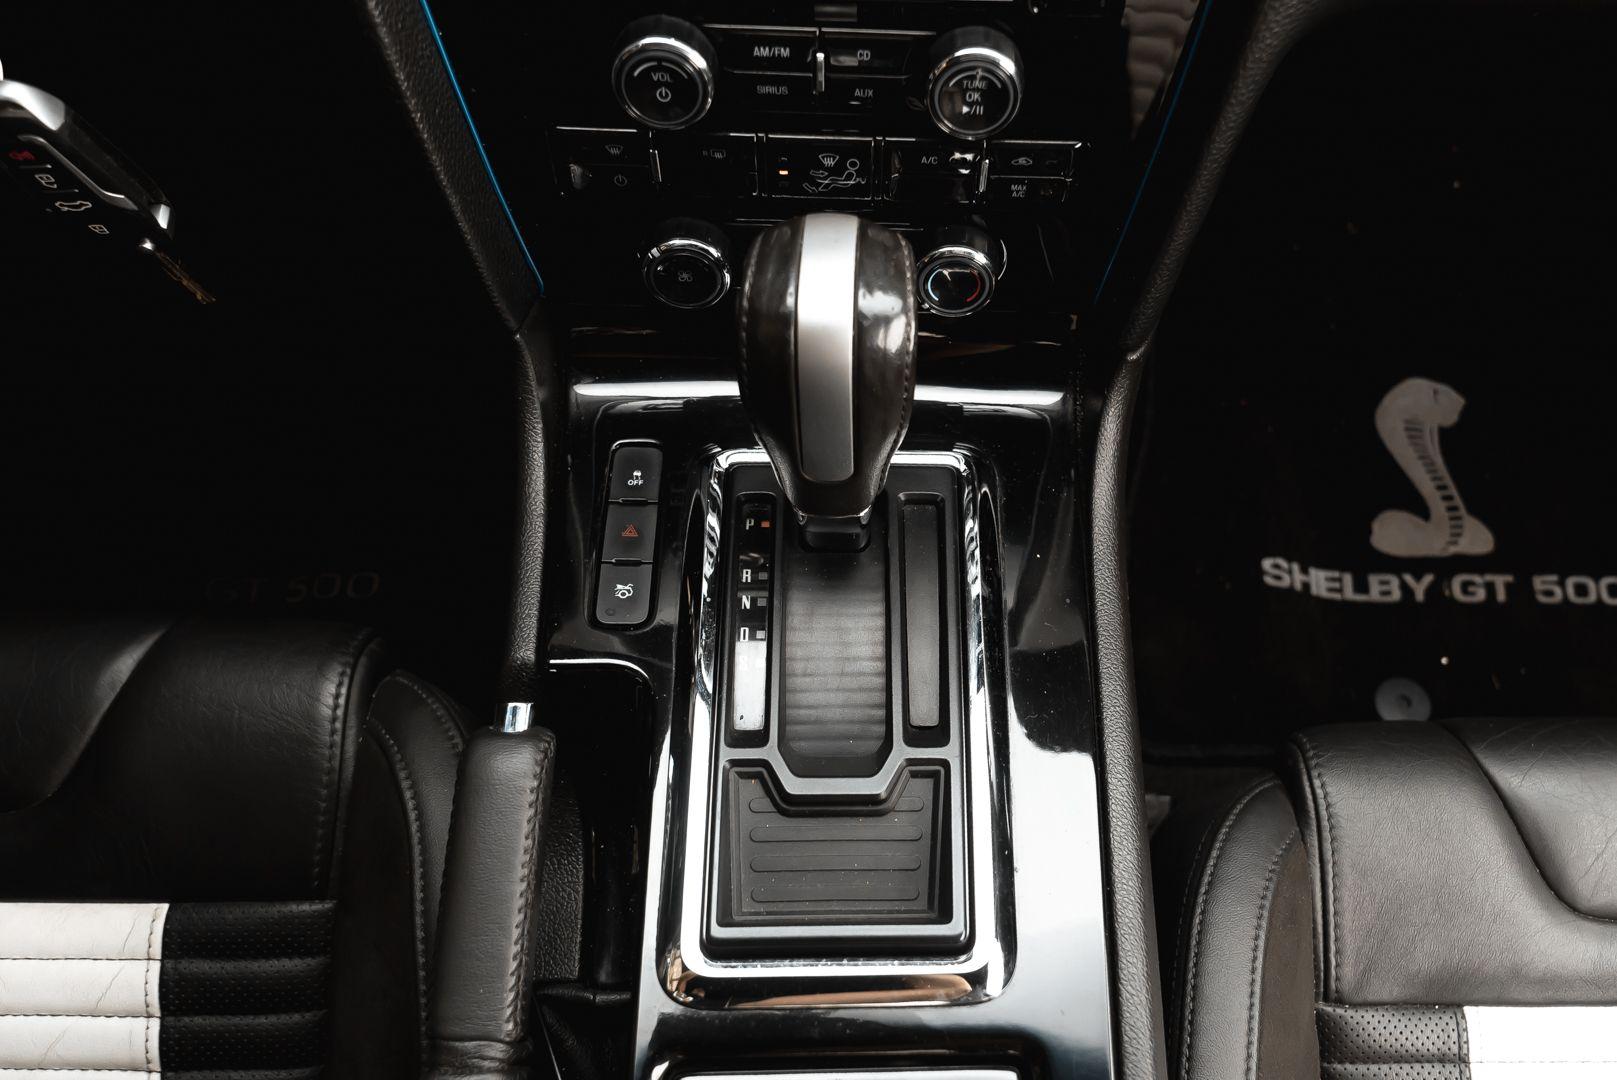 2012 Ford Mustang 5.0 V8 82106